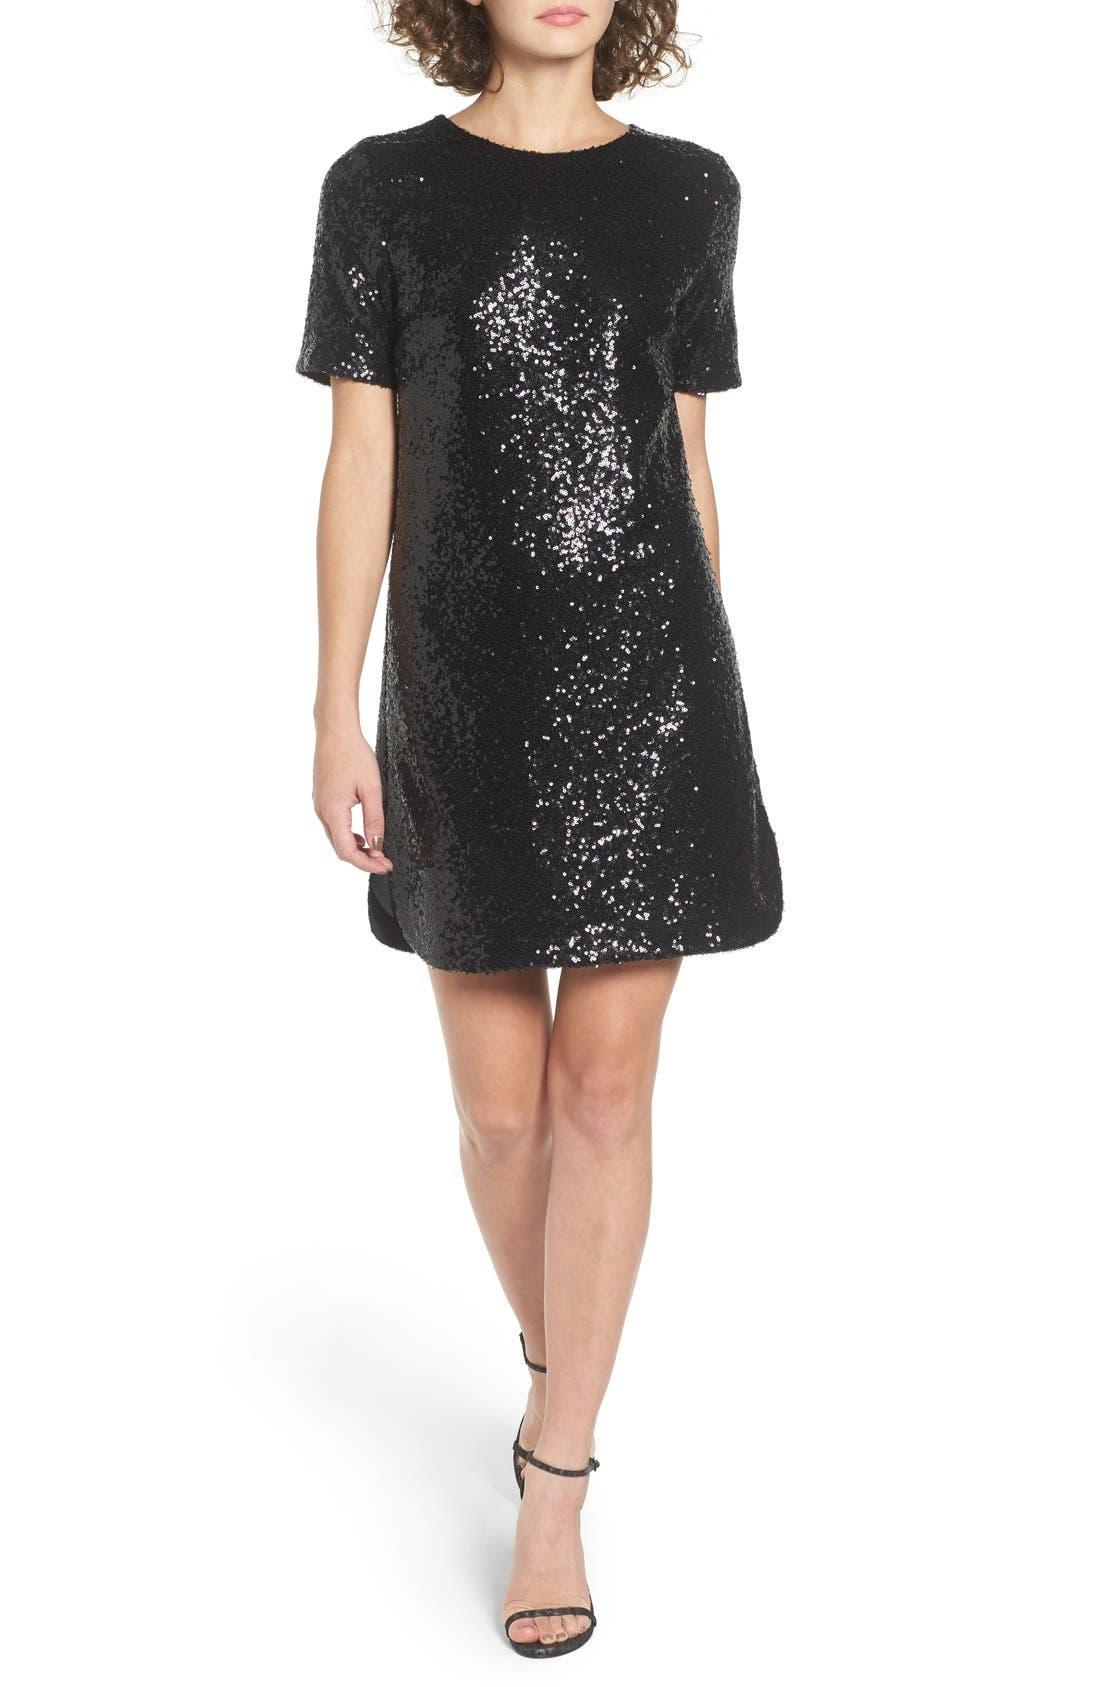 SOPRANO Sequin T-Shirt Dress, Main, color, 001